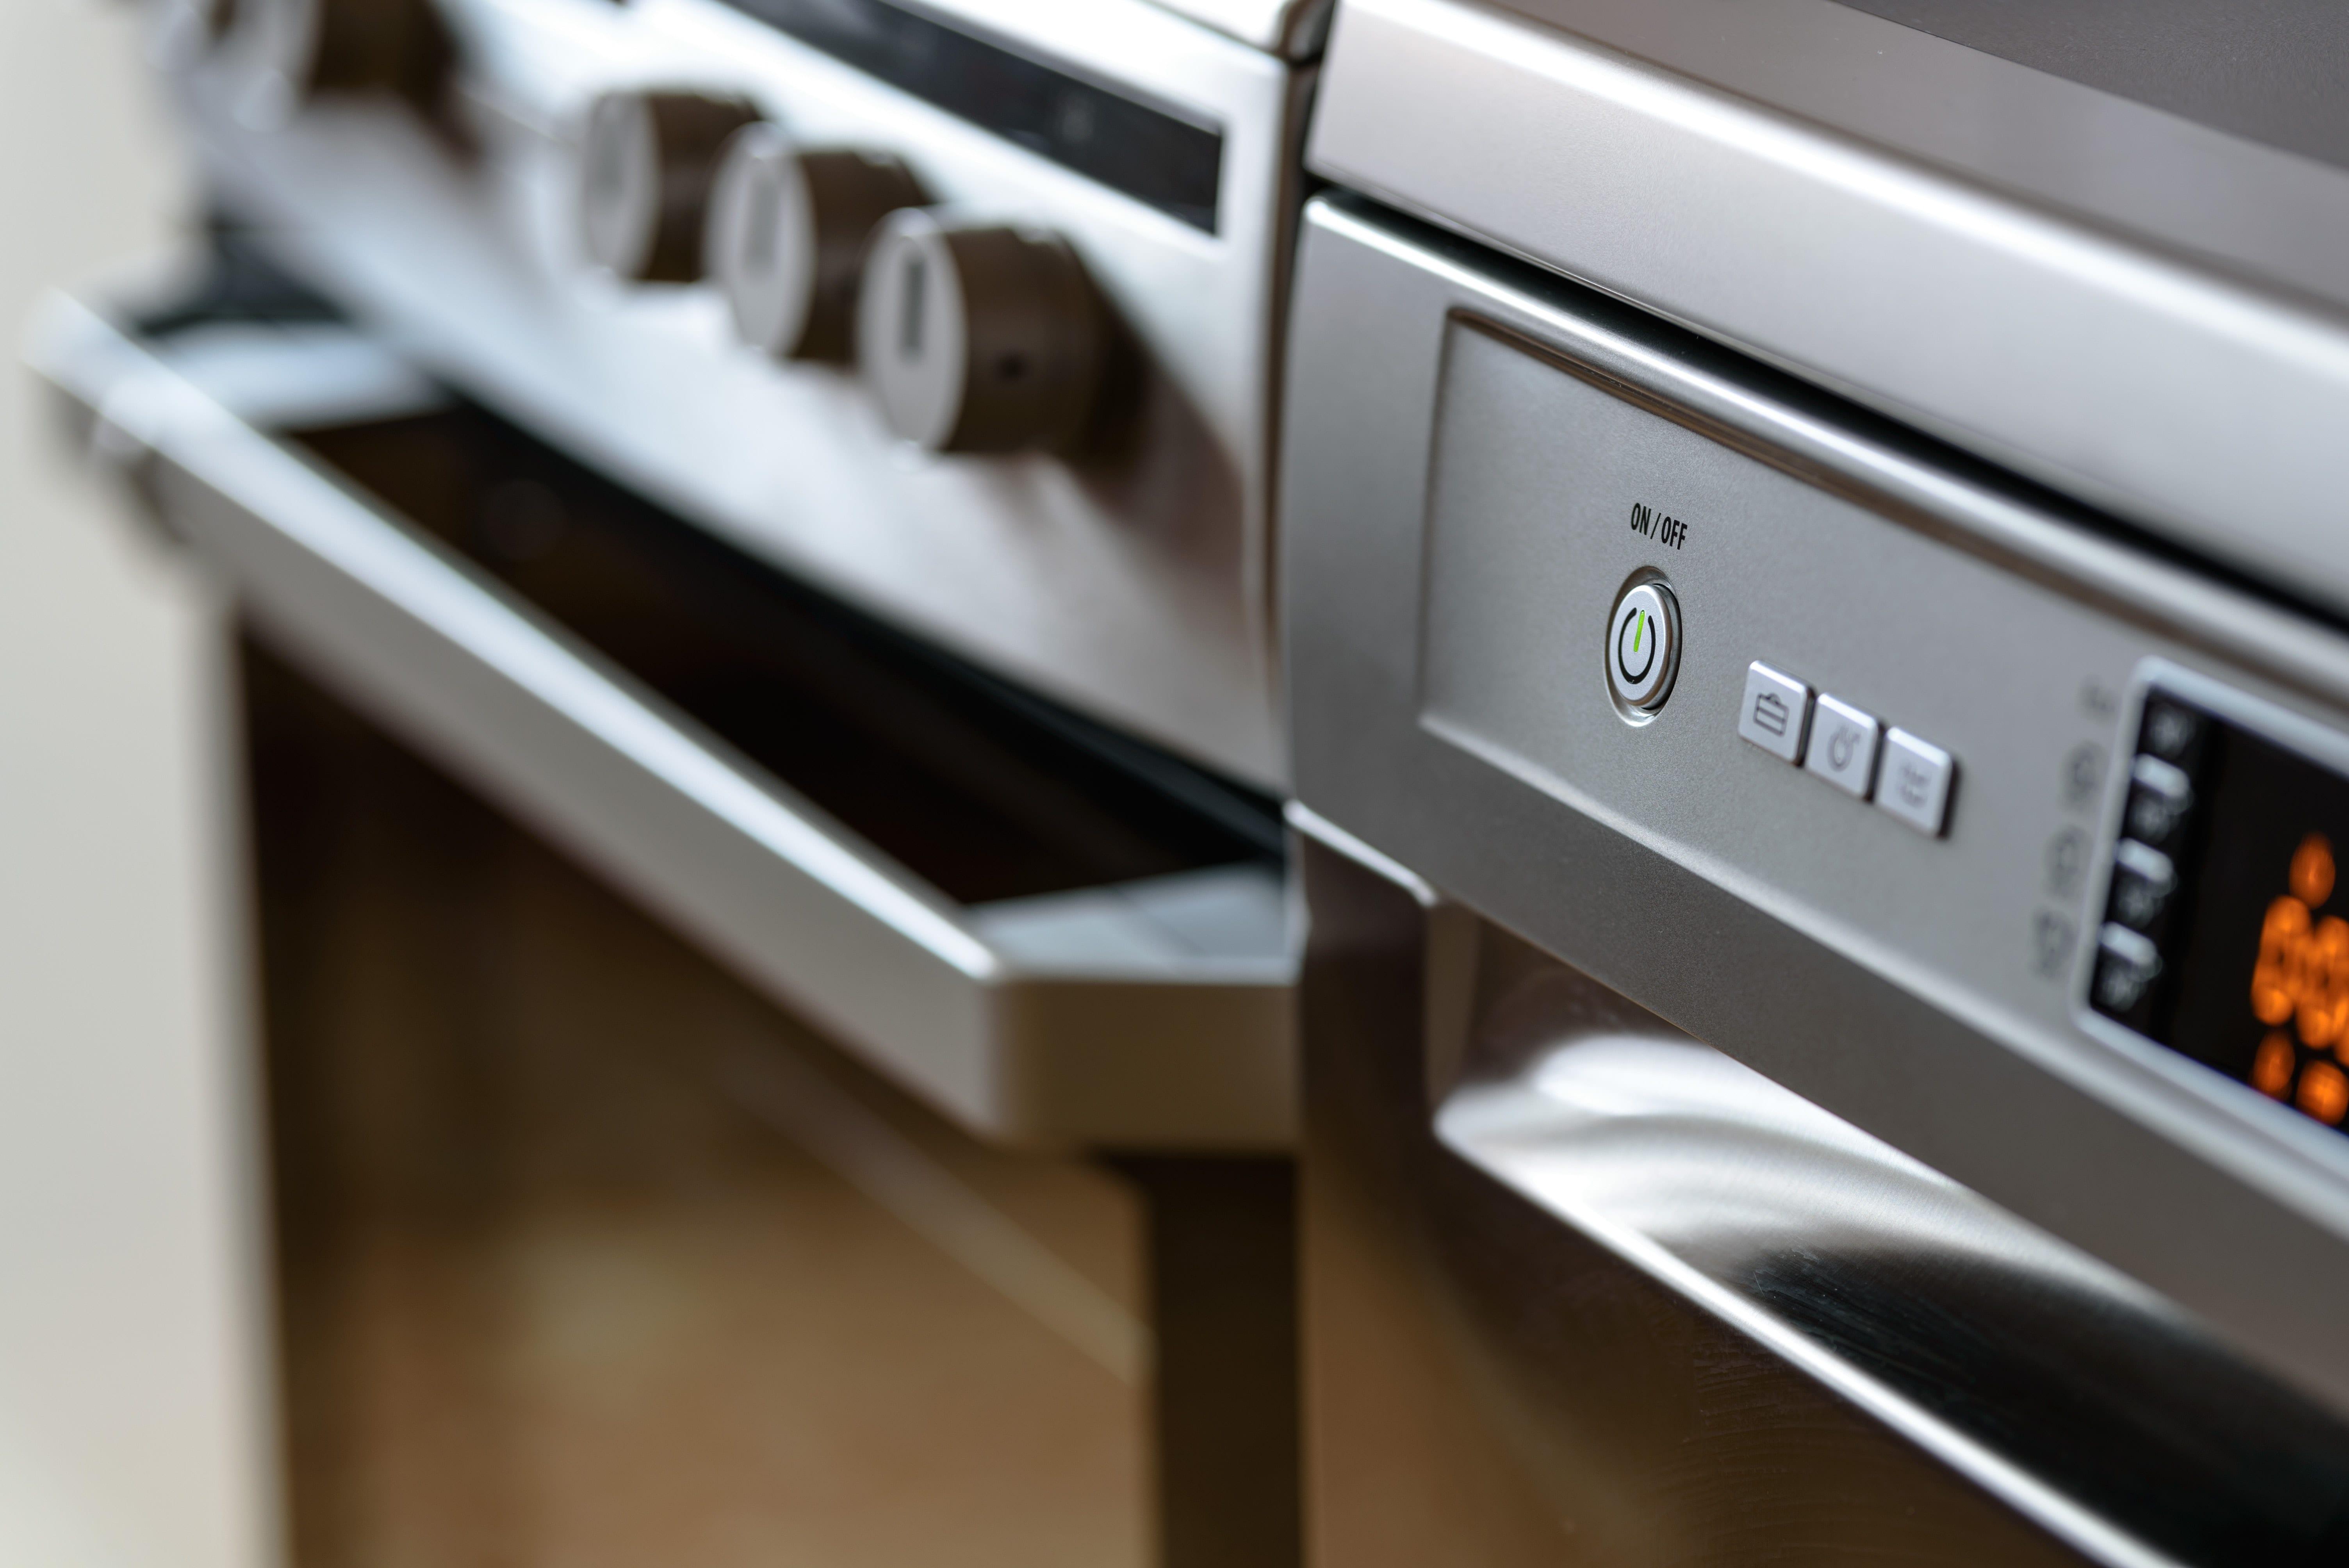 appliance testing application photo